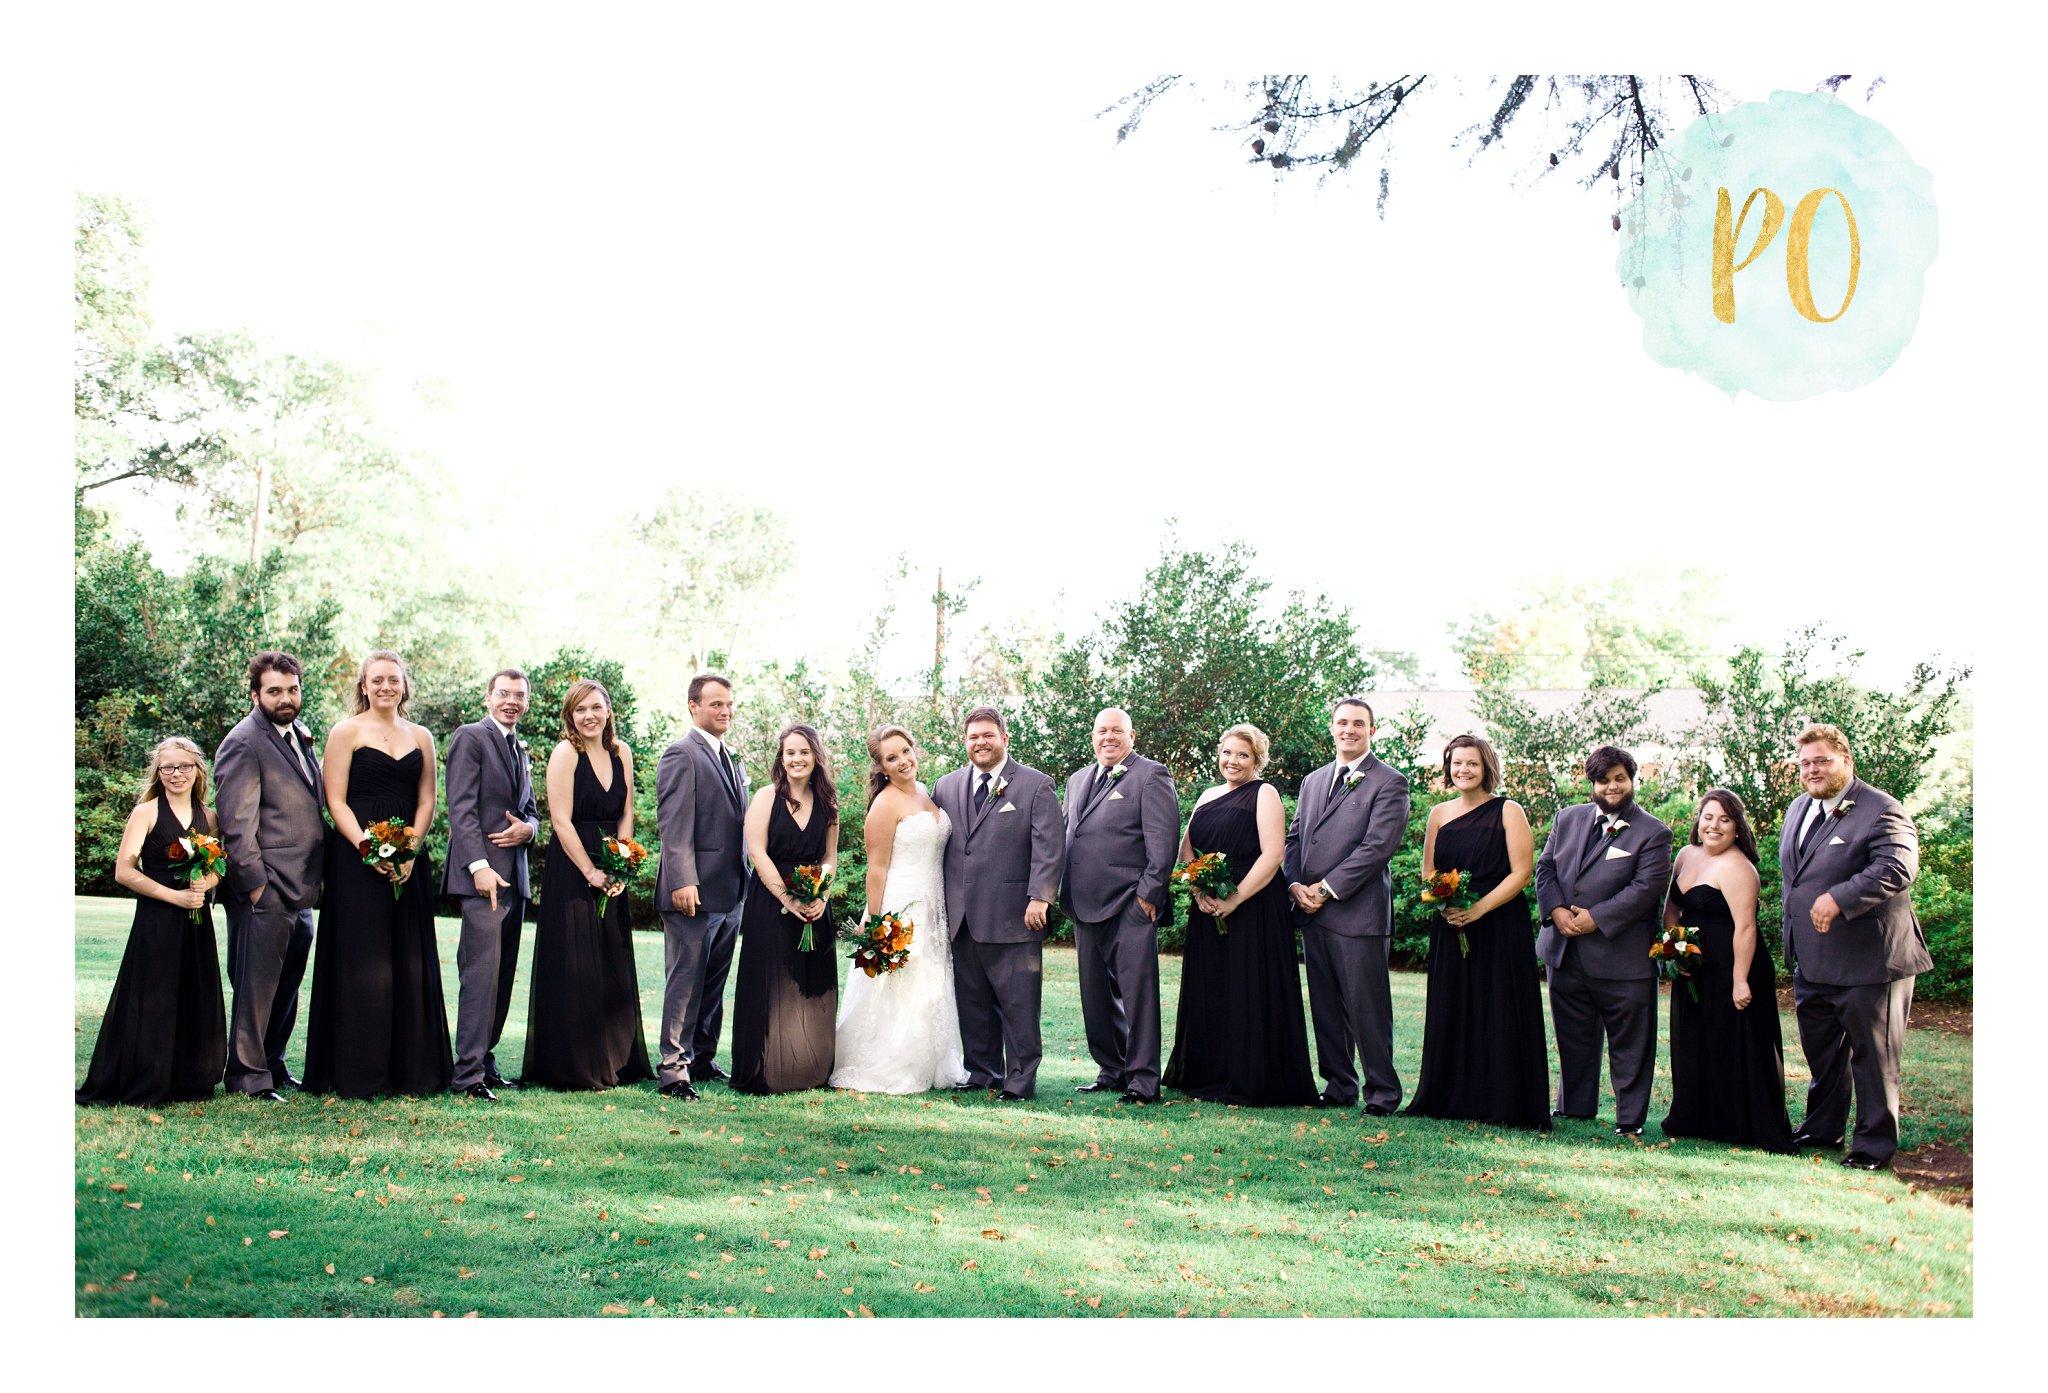 gassaway-mansion-fall-wedding-greenvile-sc-photos_0016.jpg